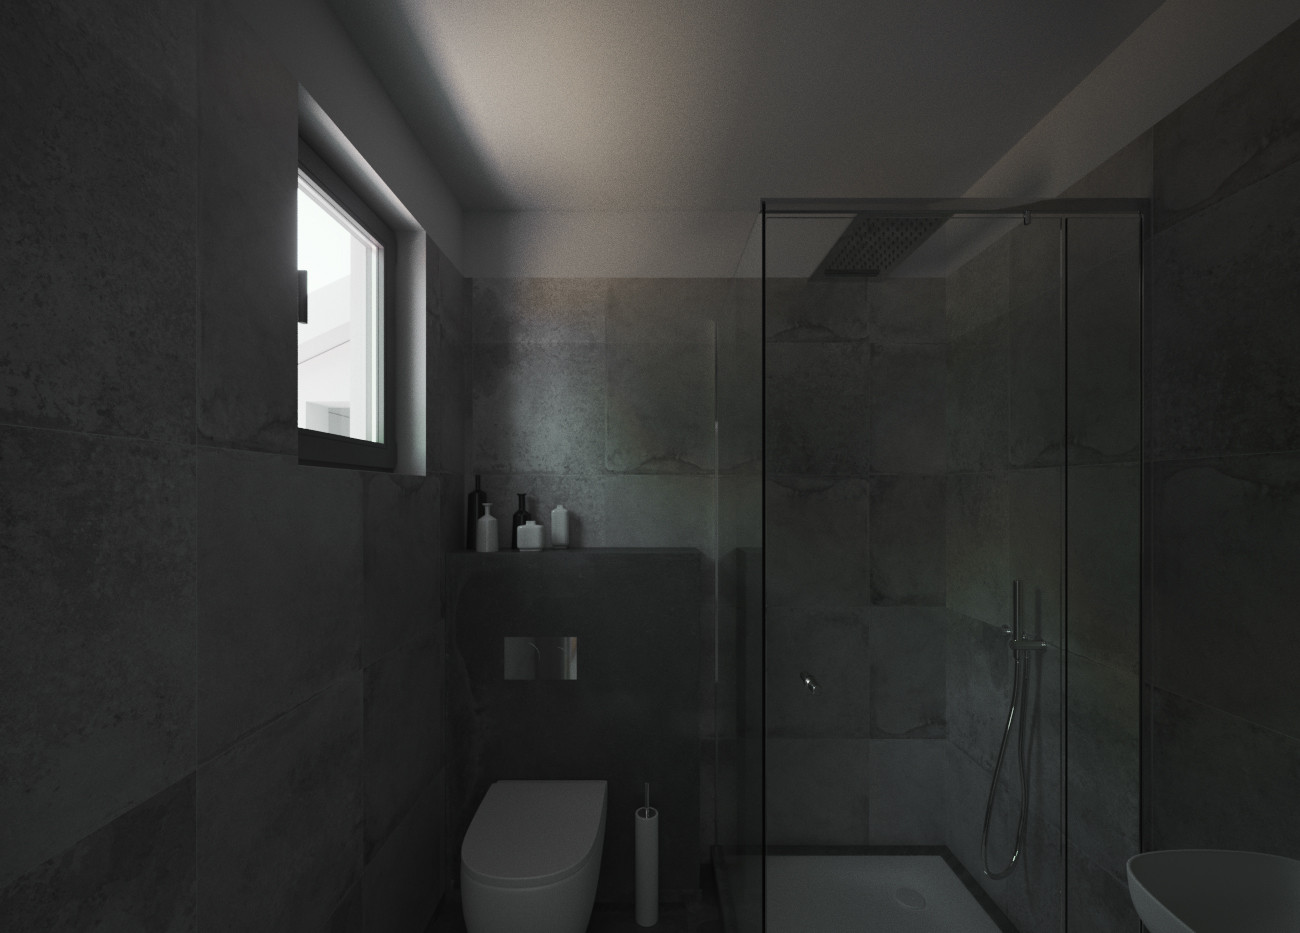 Gloomy Washroom